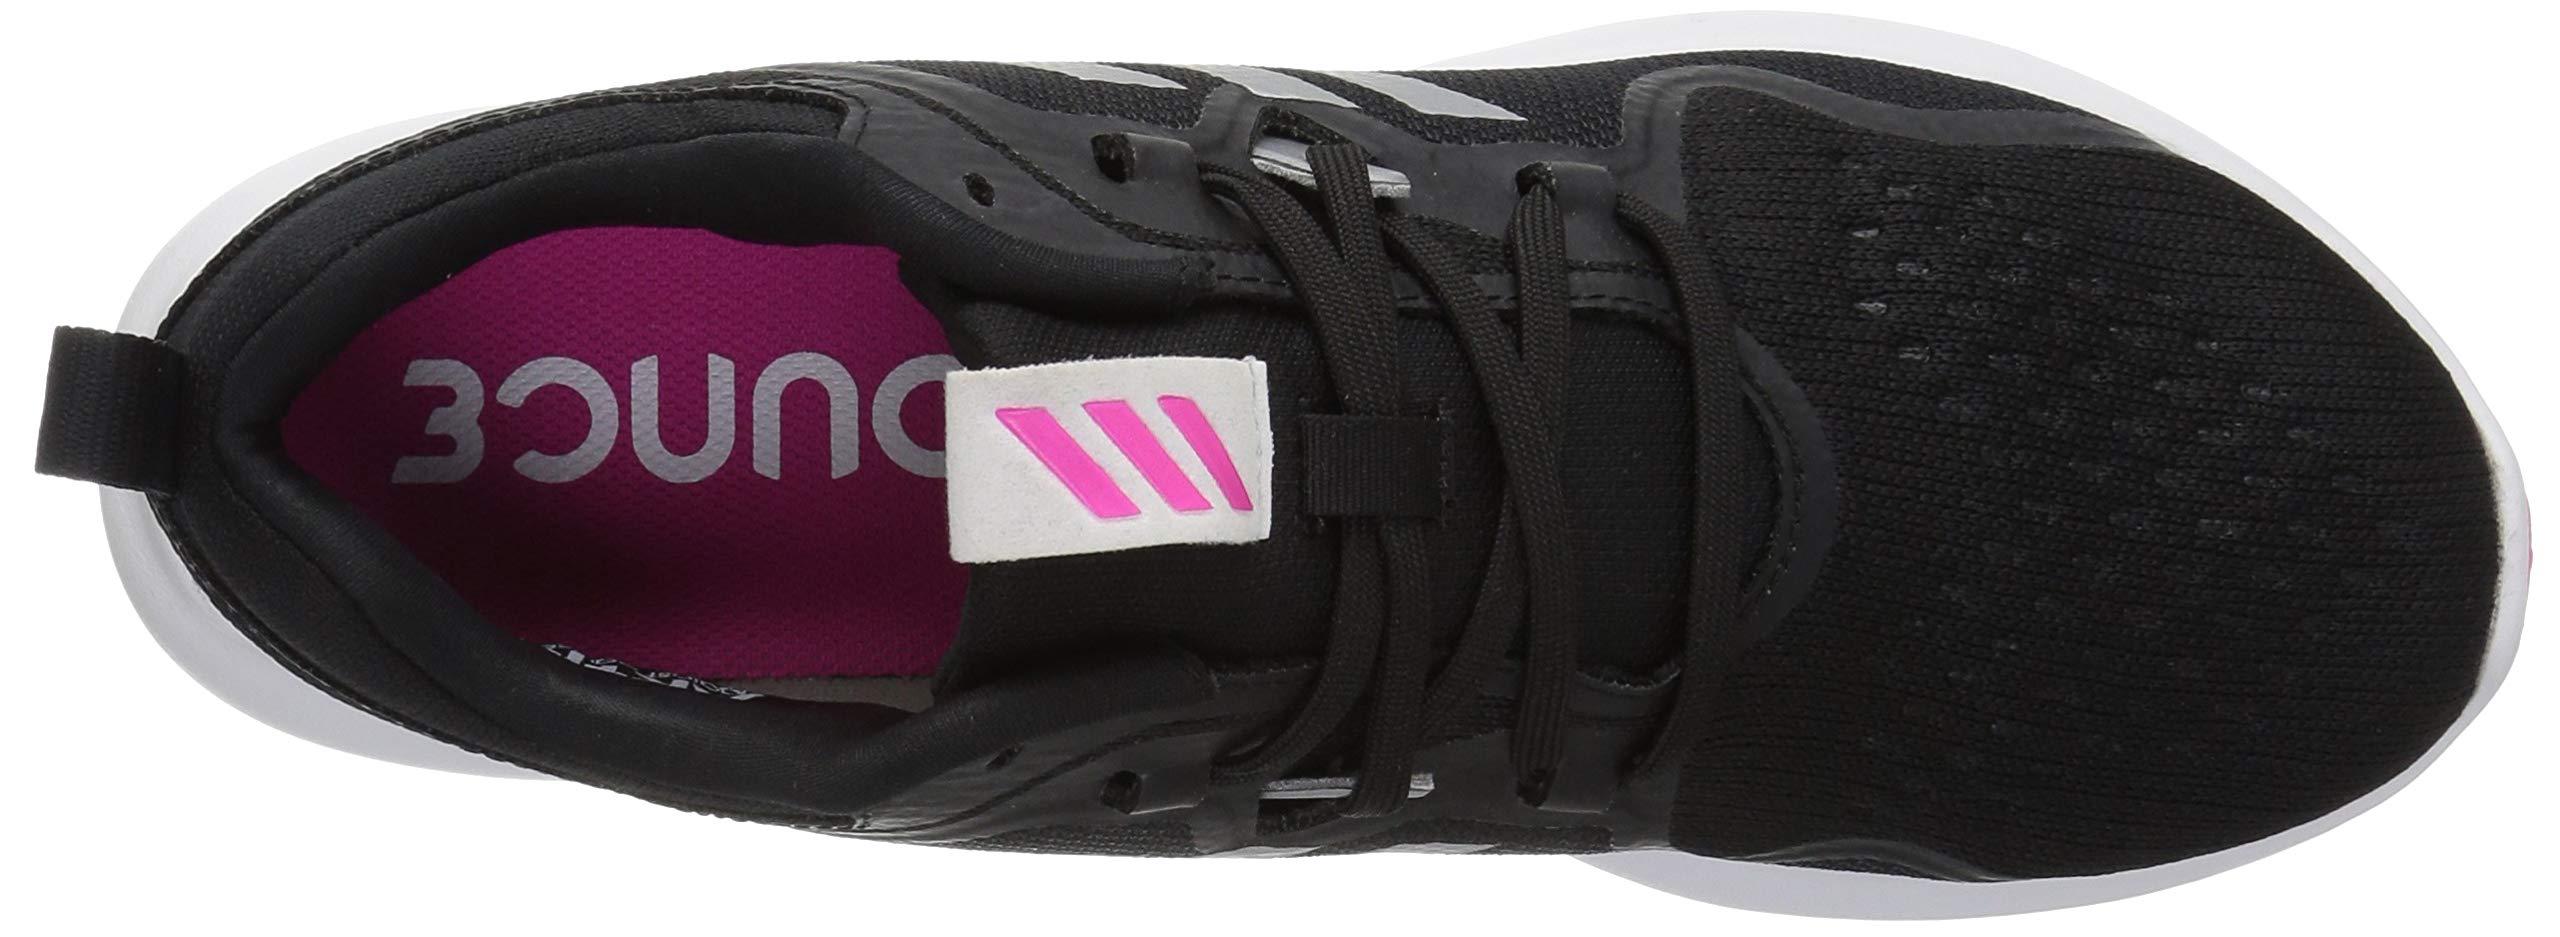 adidas Women's EdgeBounce Running Shoe, Black/Silver Metallic/Shock Pink, 5 M US by adidas (Image #7)